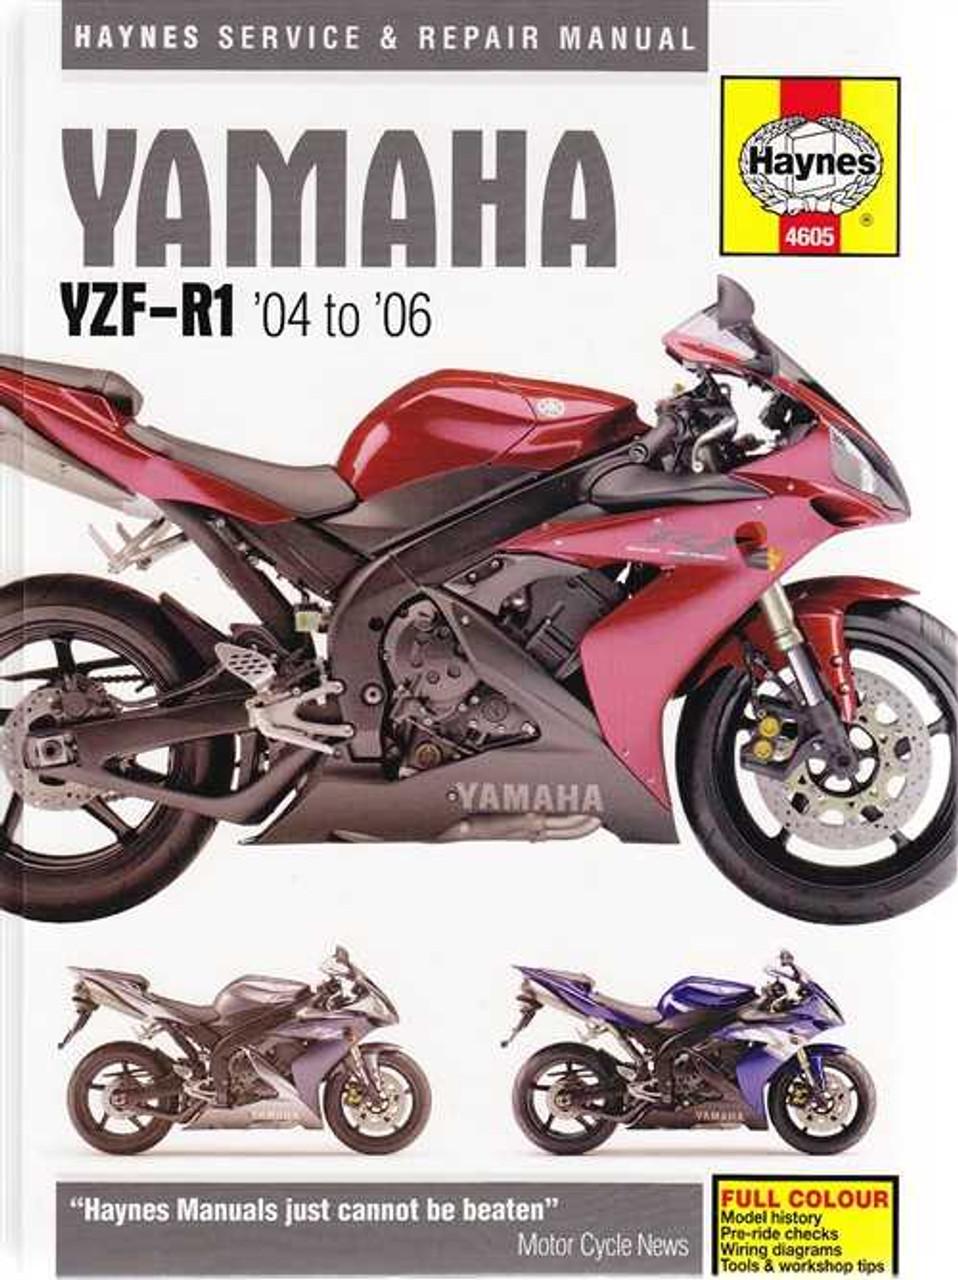 yamaha yzf r1 2004 2006 workshop manual2006 Yamaha Yzf R1 Wiring Diagram #17